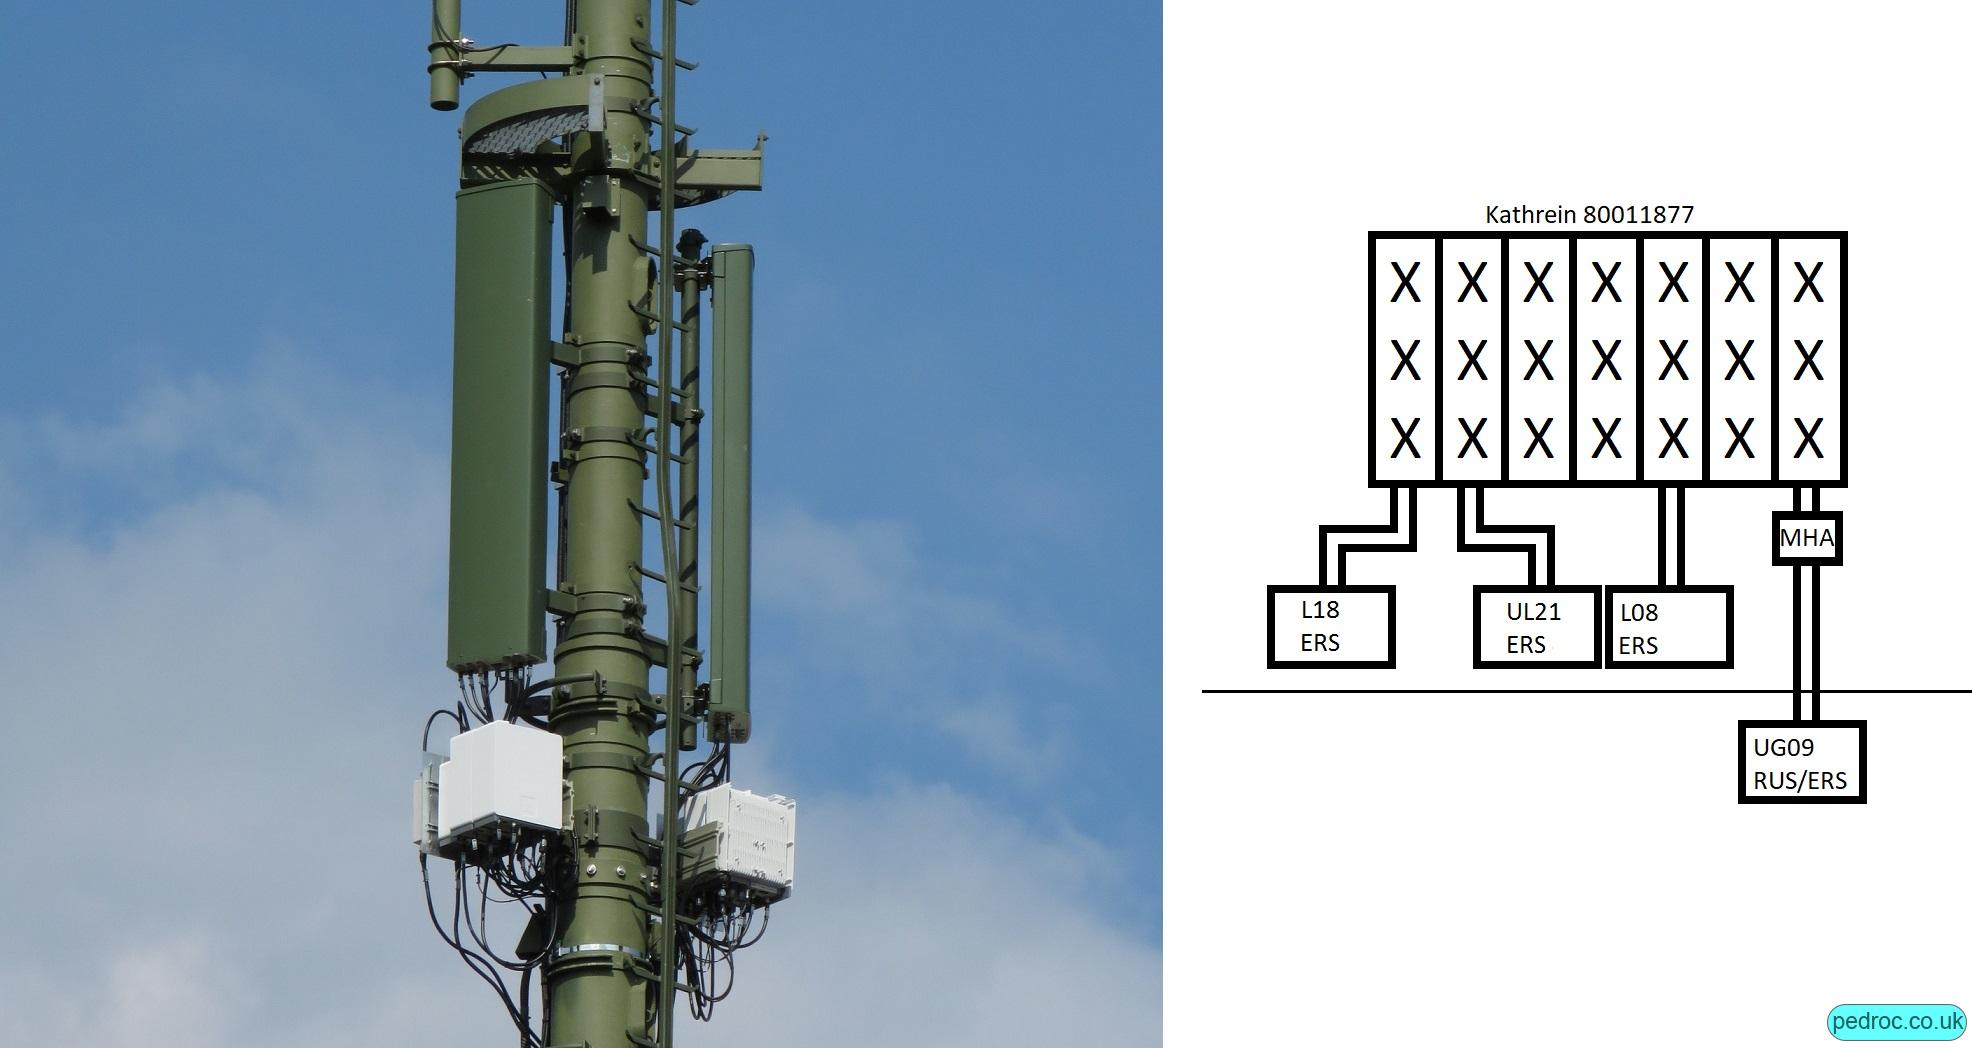 Kathrein 14 port 3CA Swisscom